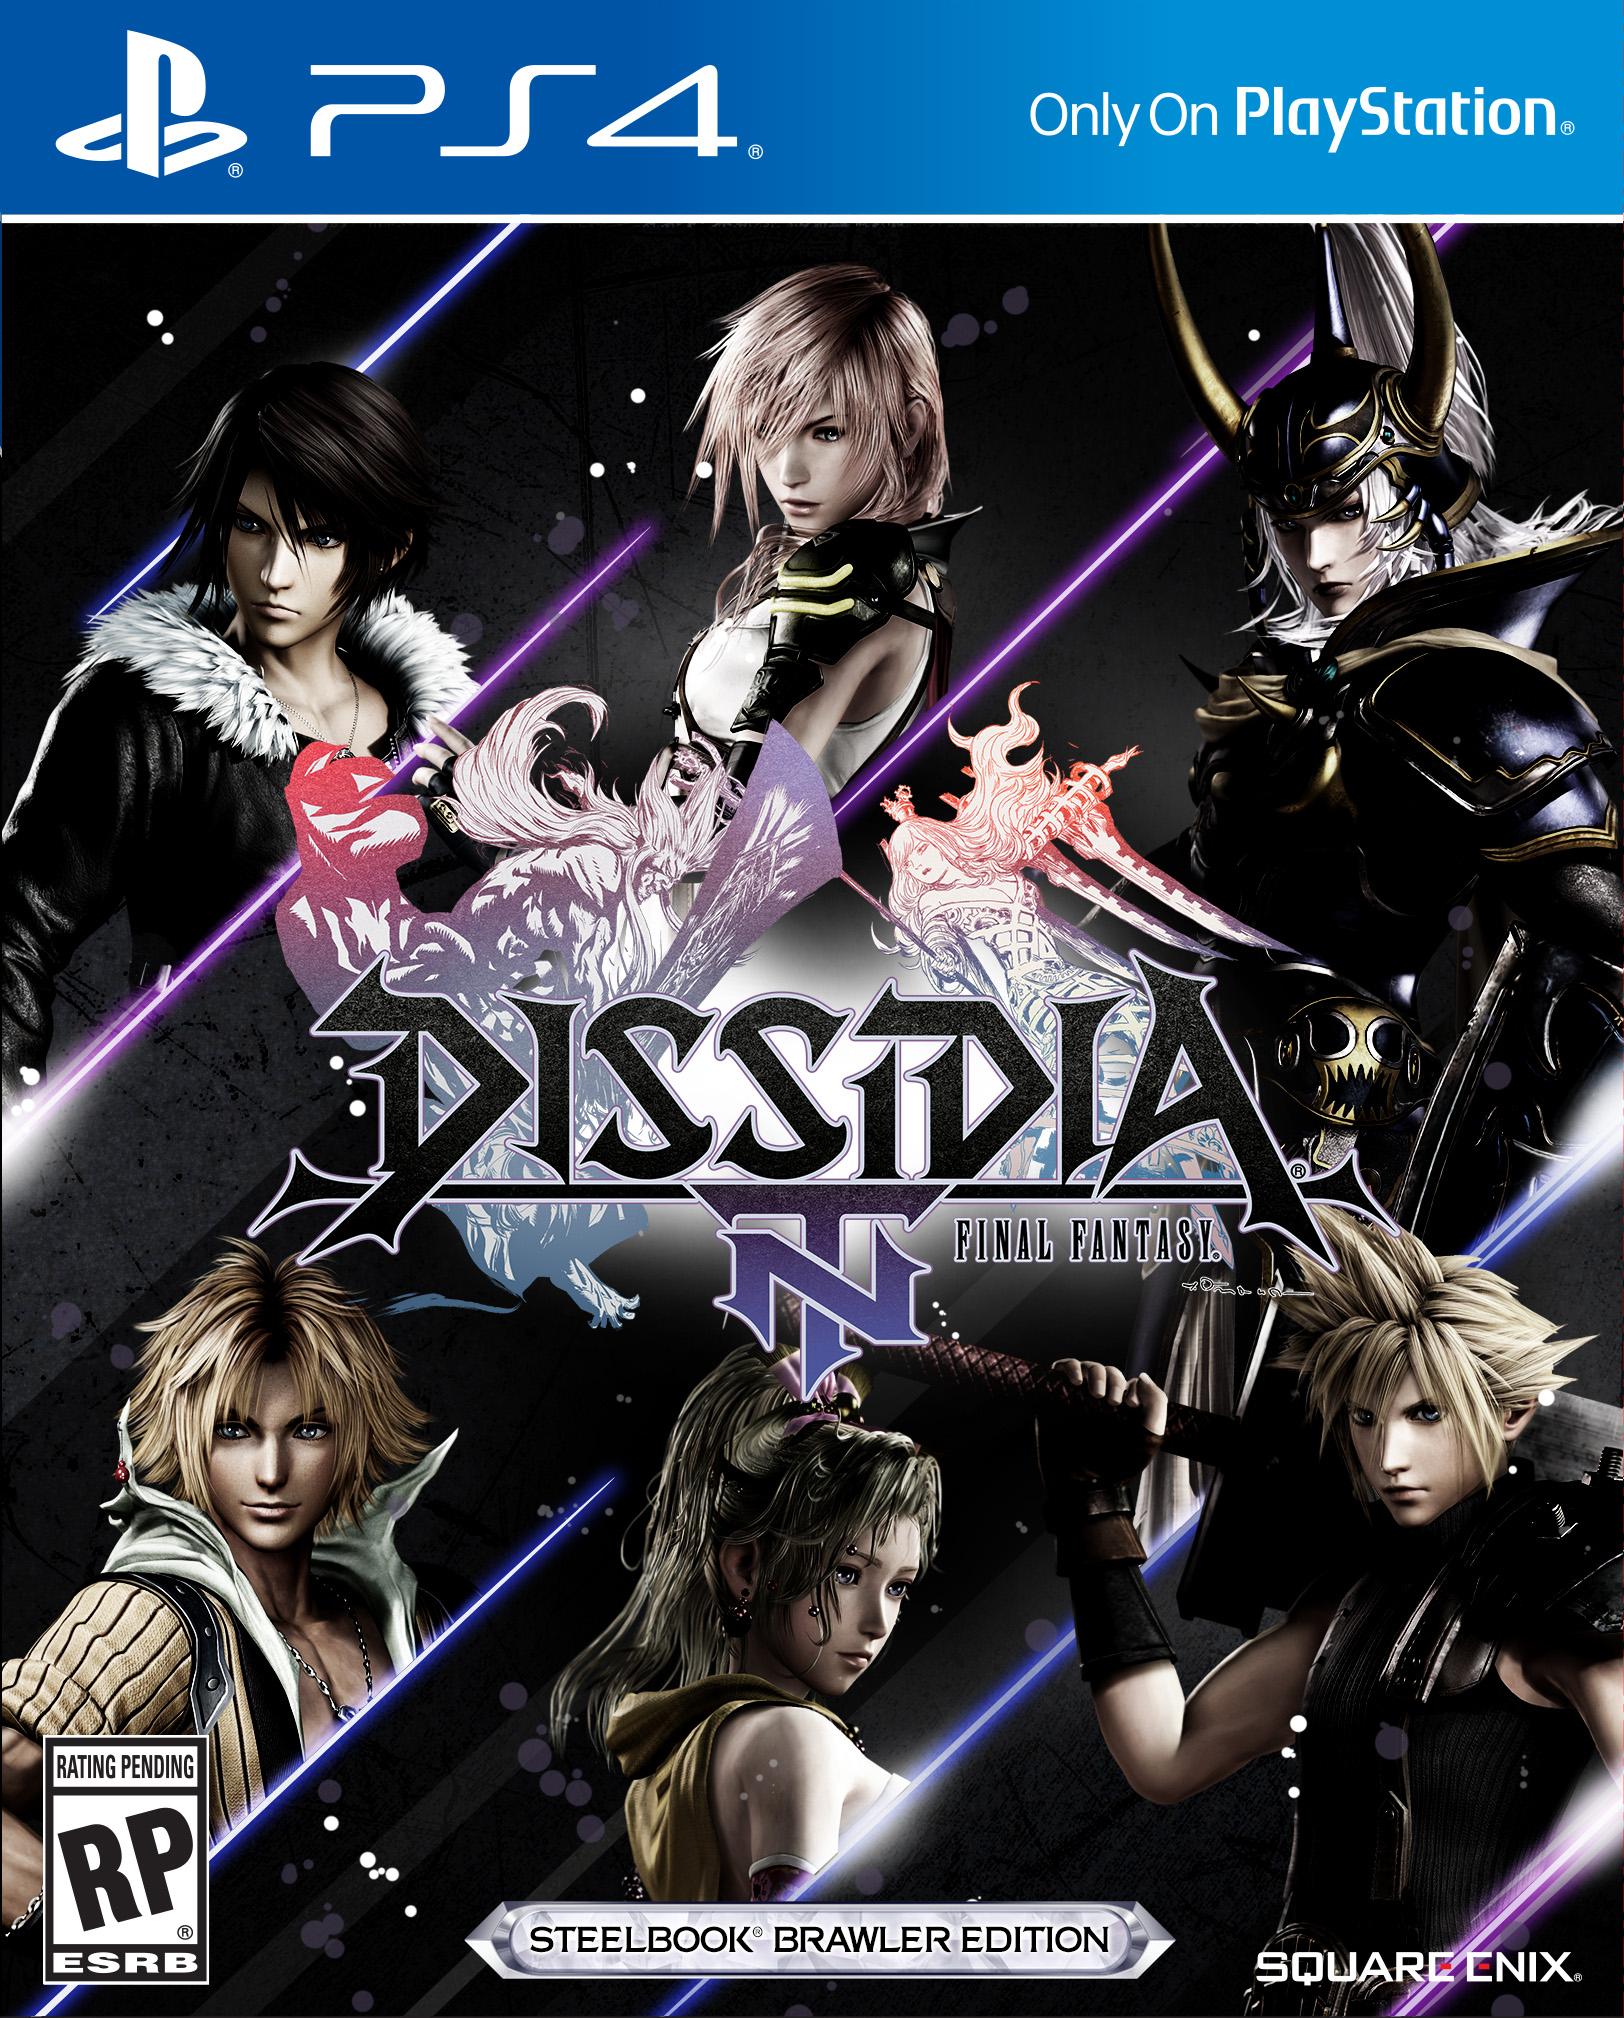 Dissida Final Fantasy NT Cover Art 01